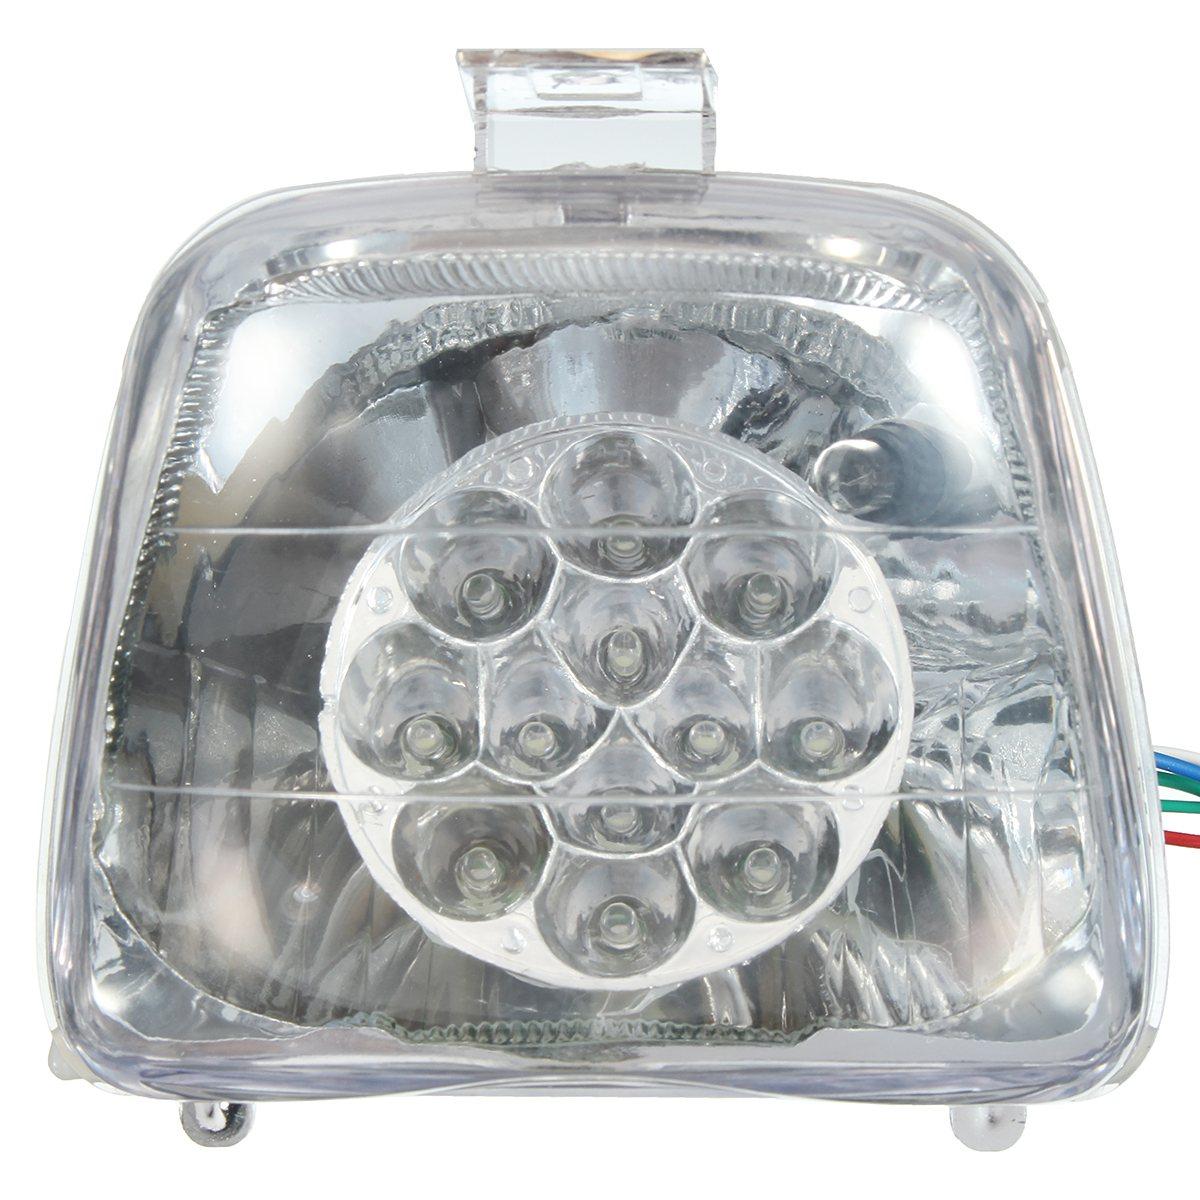 Headlight Night Light Lamp Fit Chinese ATV 4 Wheeler Quad Buggy ATV